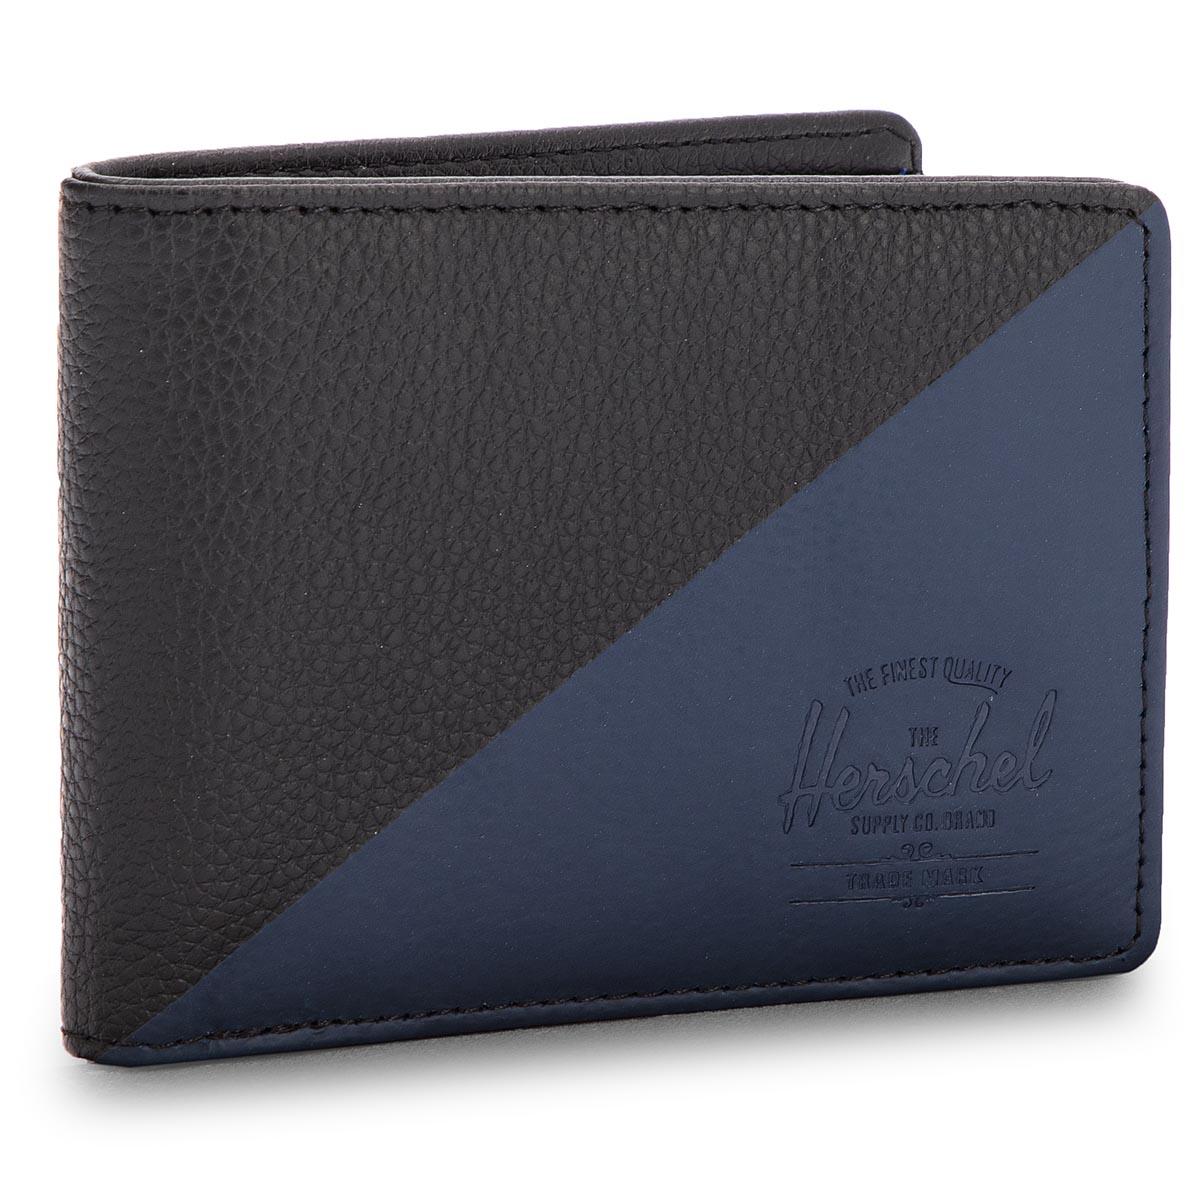 Nagy férfi pénztárca CALVIN KLEIN BLACK LABEL - Essential 10Cc Coin ... 4d49e5d9b0